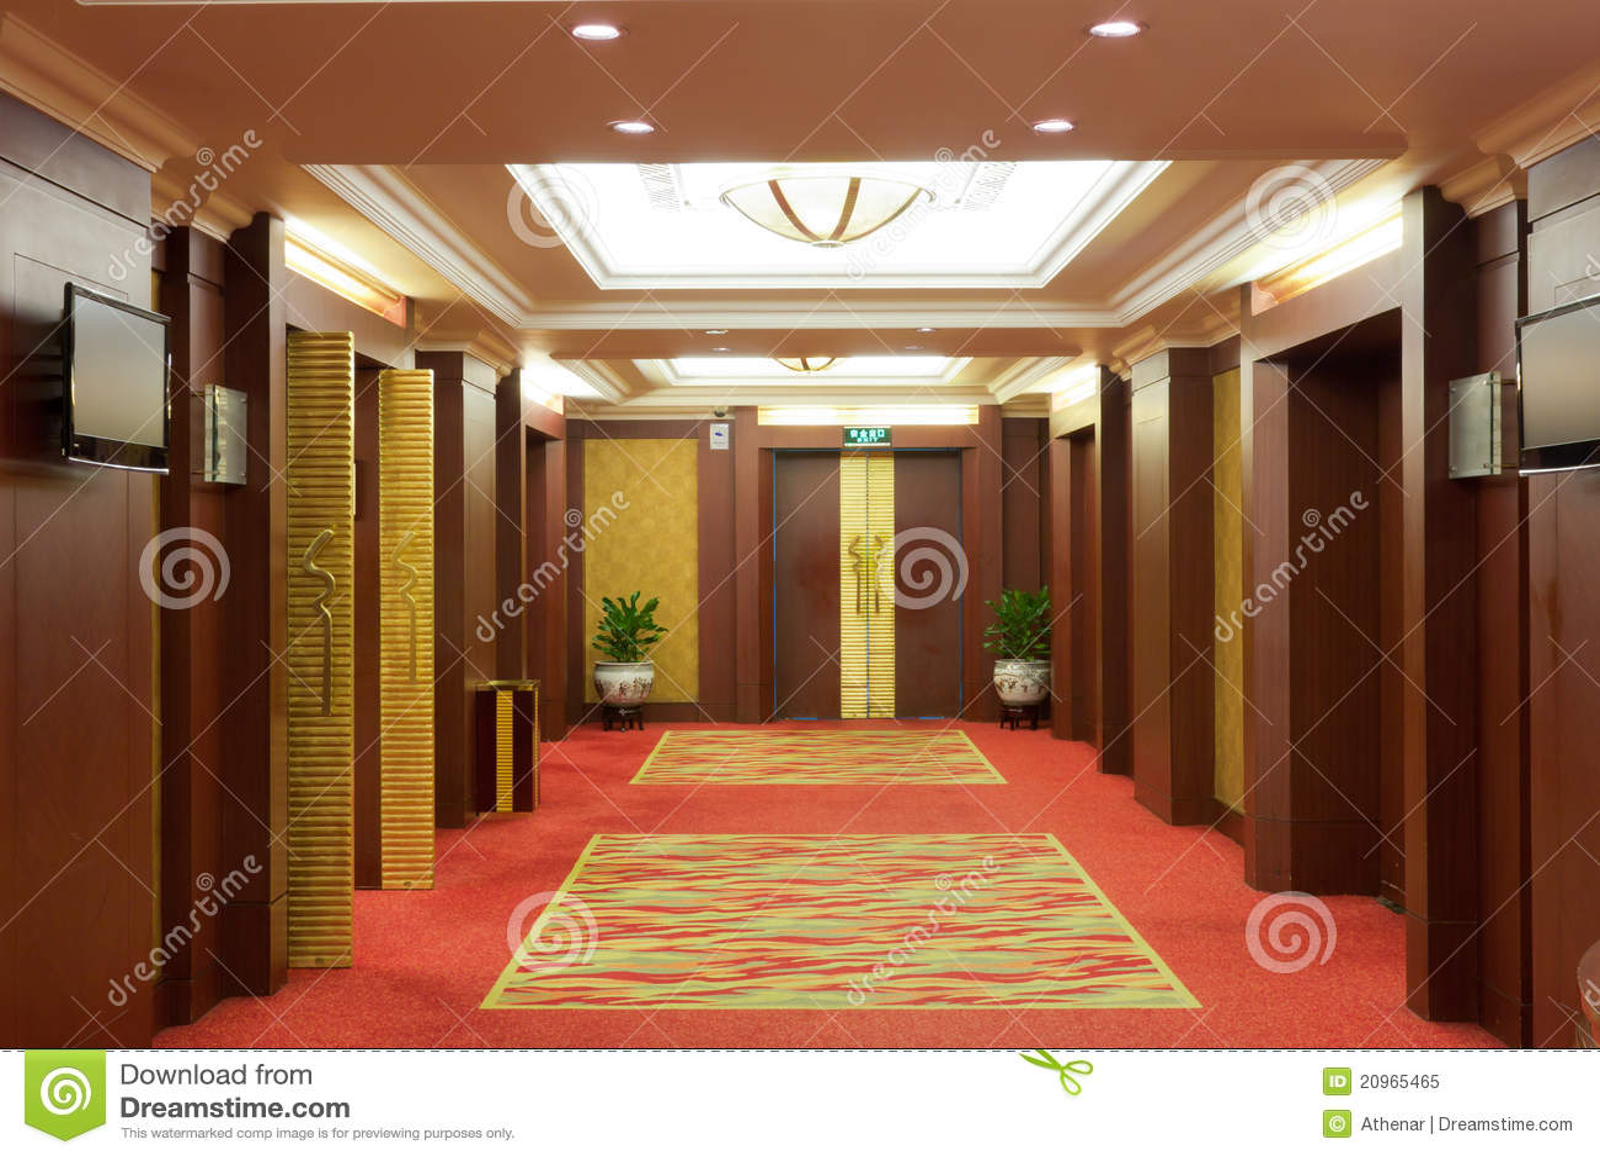 Luxury Hotel Corridor Interior Royalty Free Stock Photo